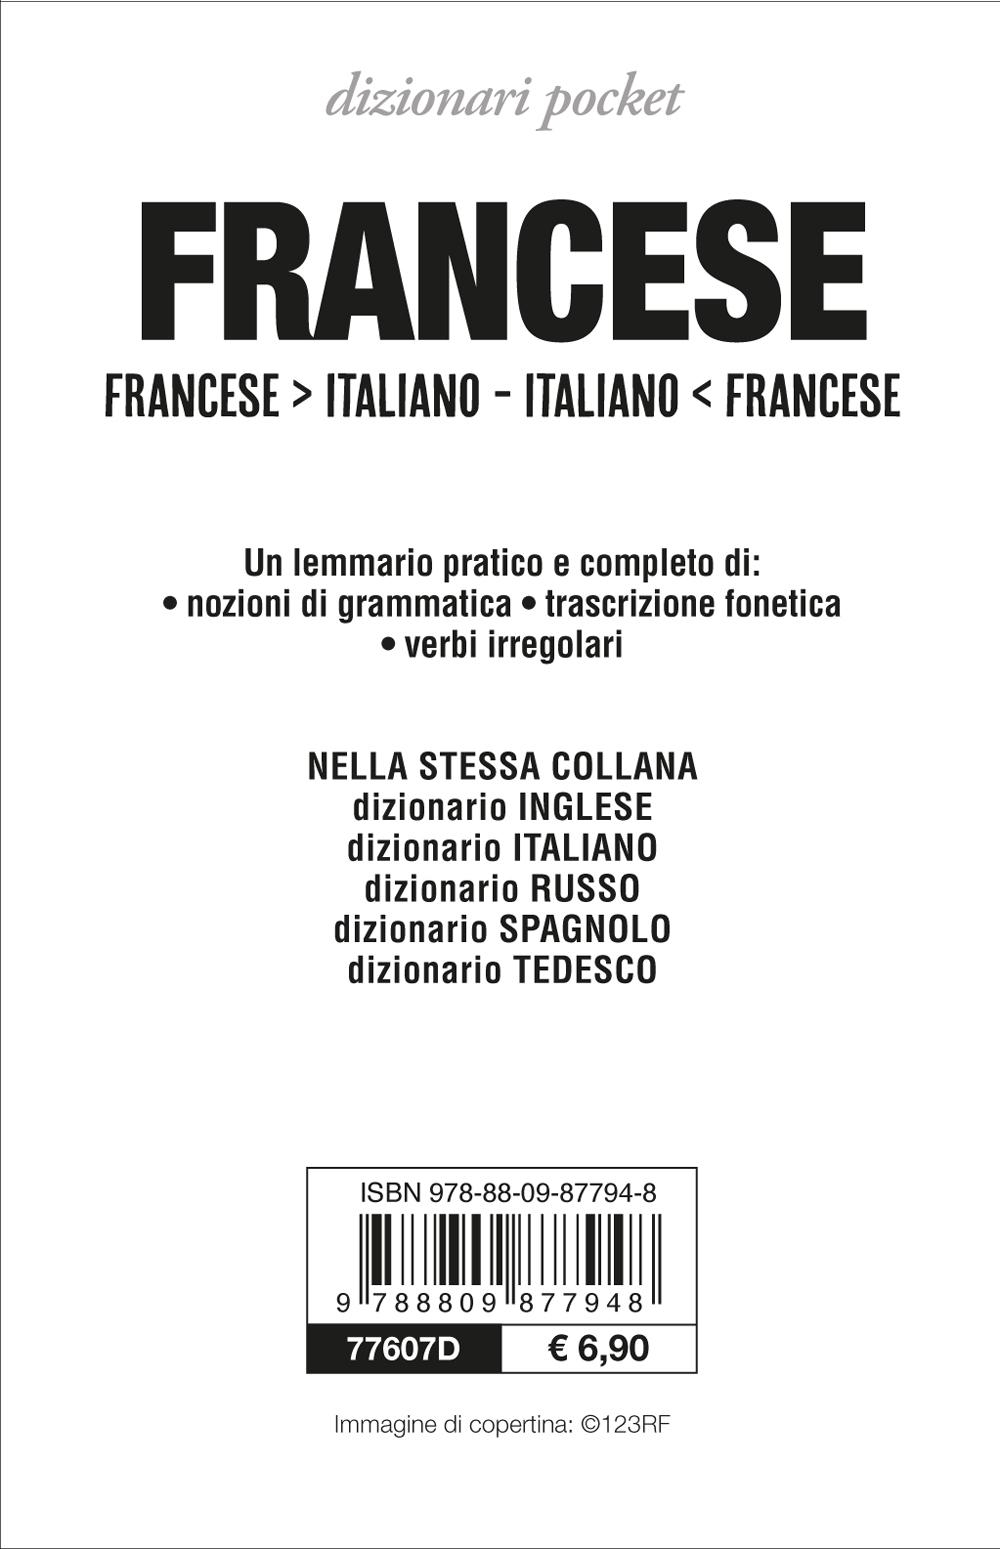 Dizionario francese-italiano, italiano-francese